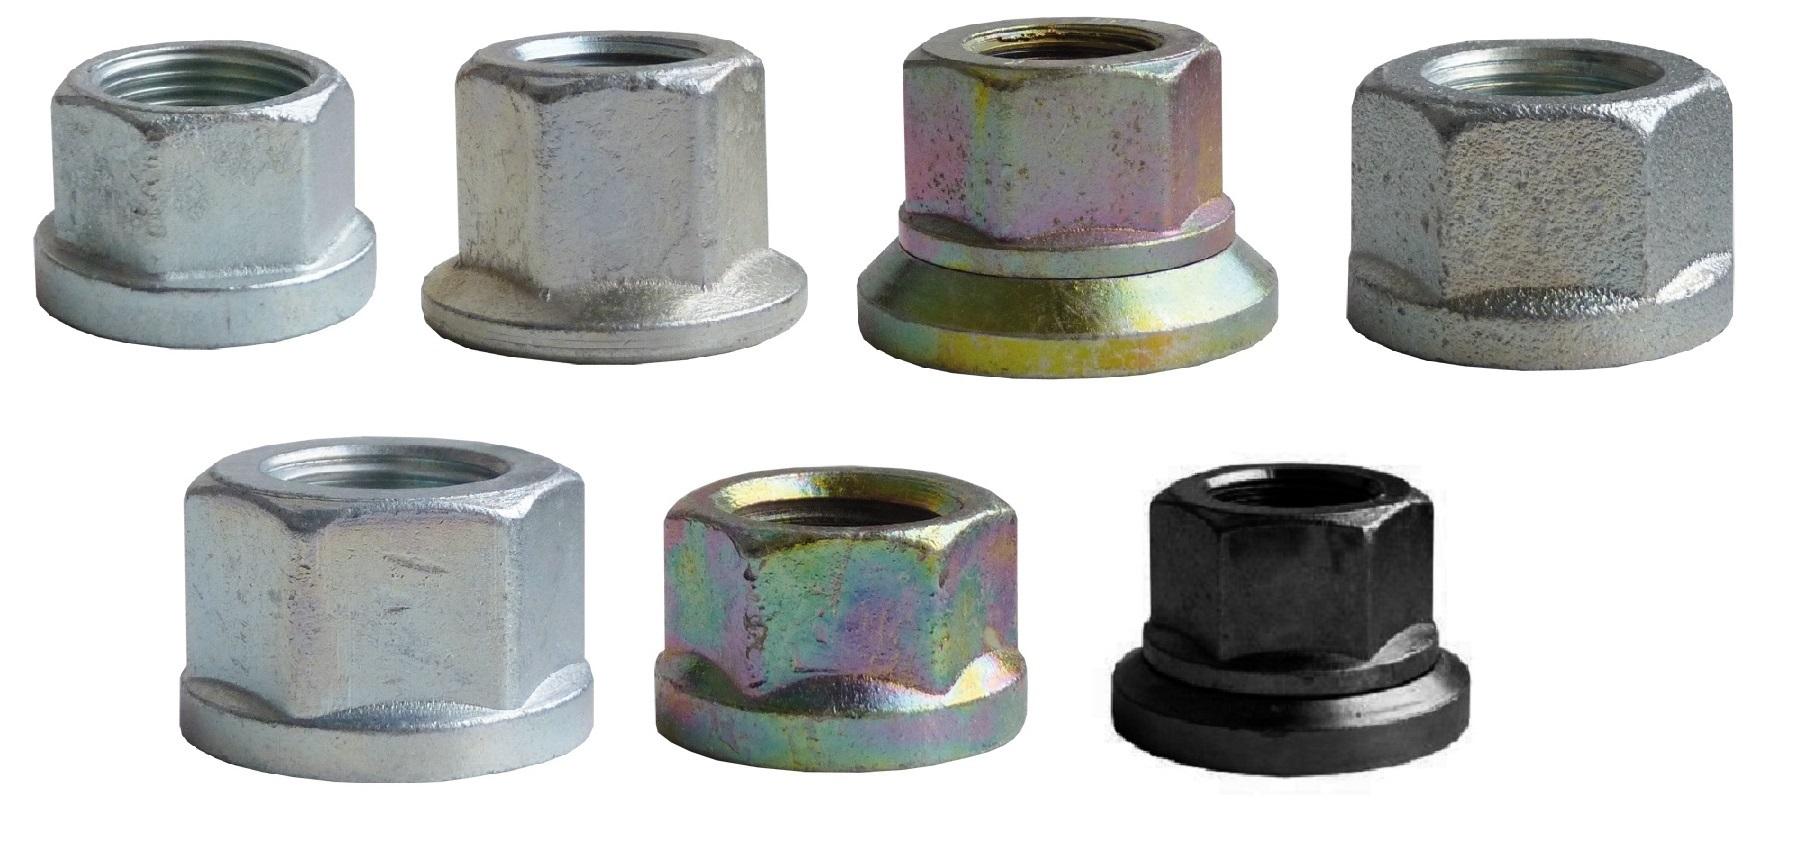 Diskové matice, rovná dosedací plocha, pro Avia, Tatra, různé rozměry - Ferdus